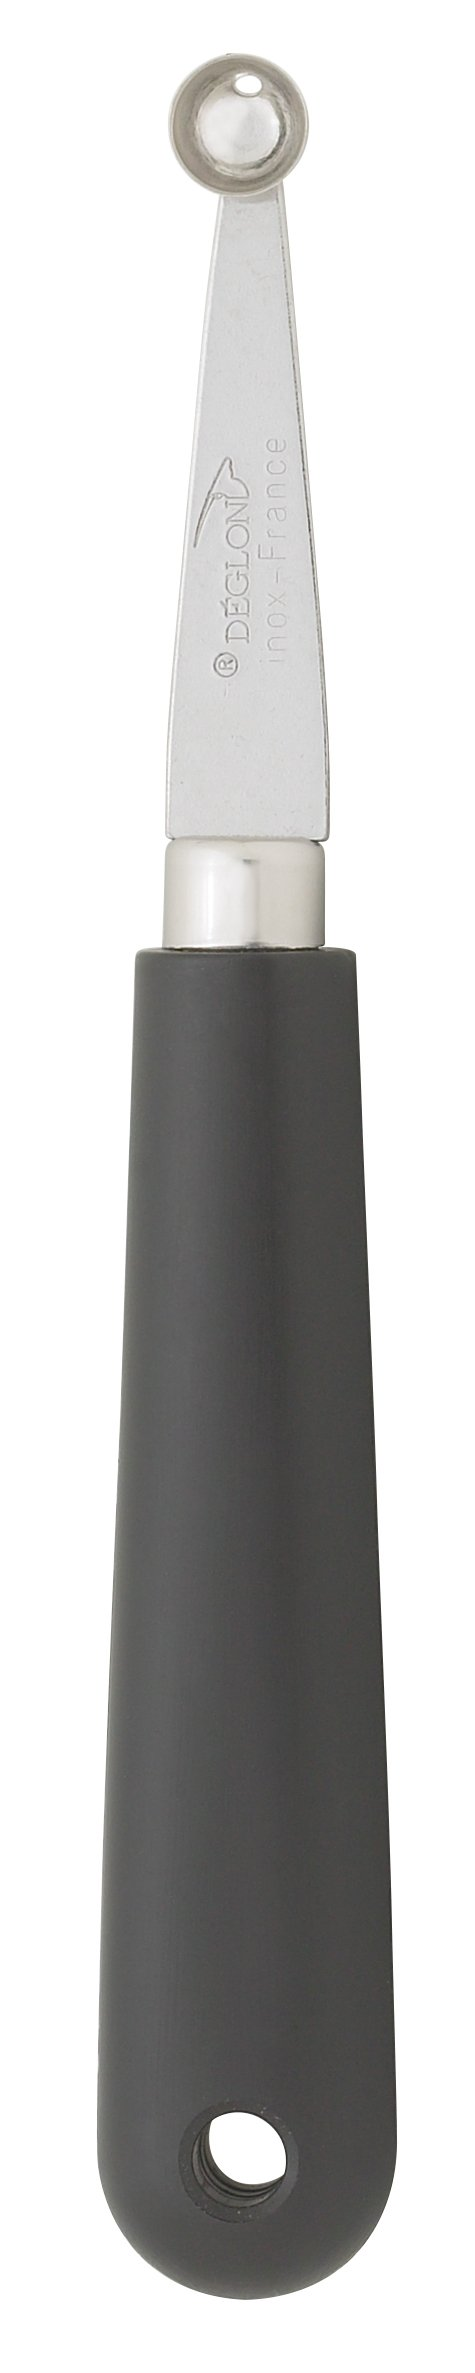 Deglon Melon Baller, Stainless Steel, 10-mm by Deglon